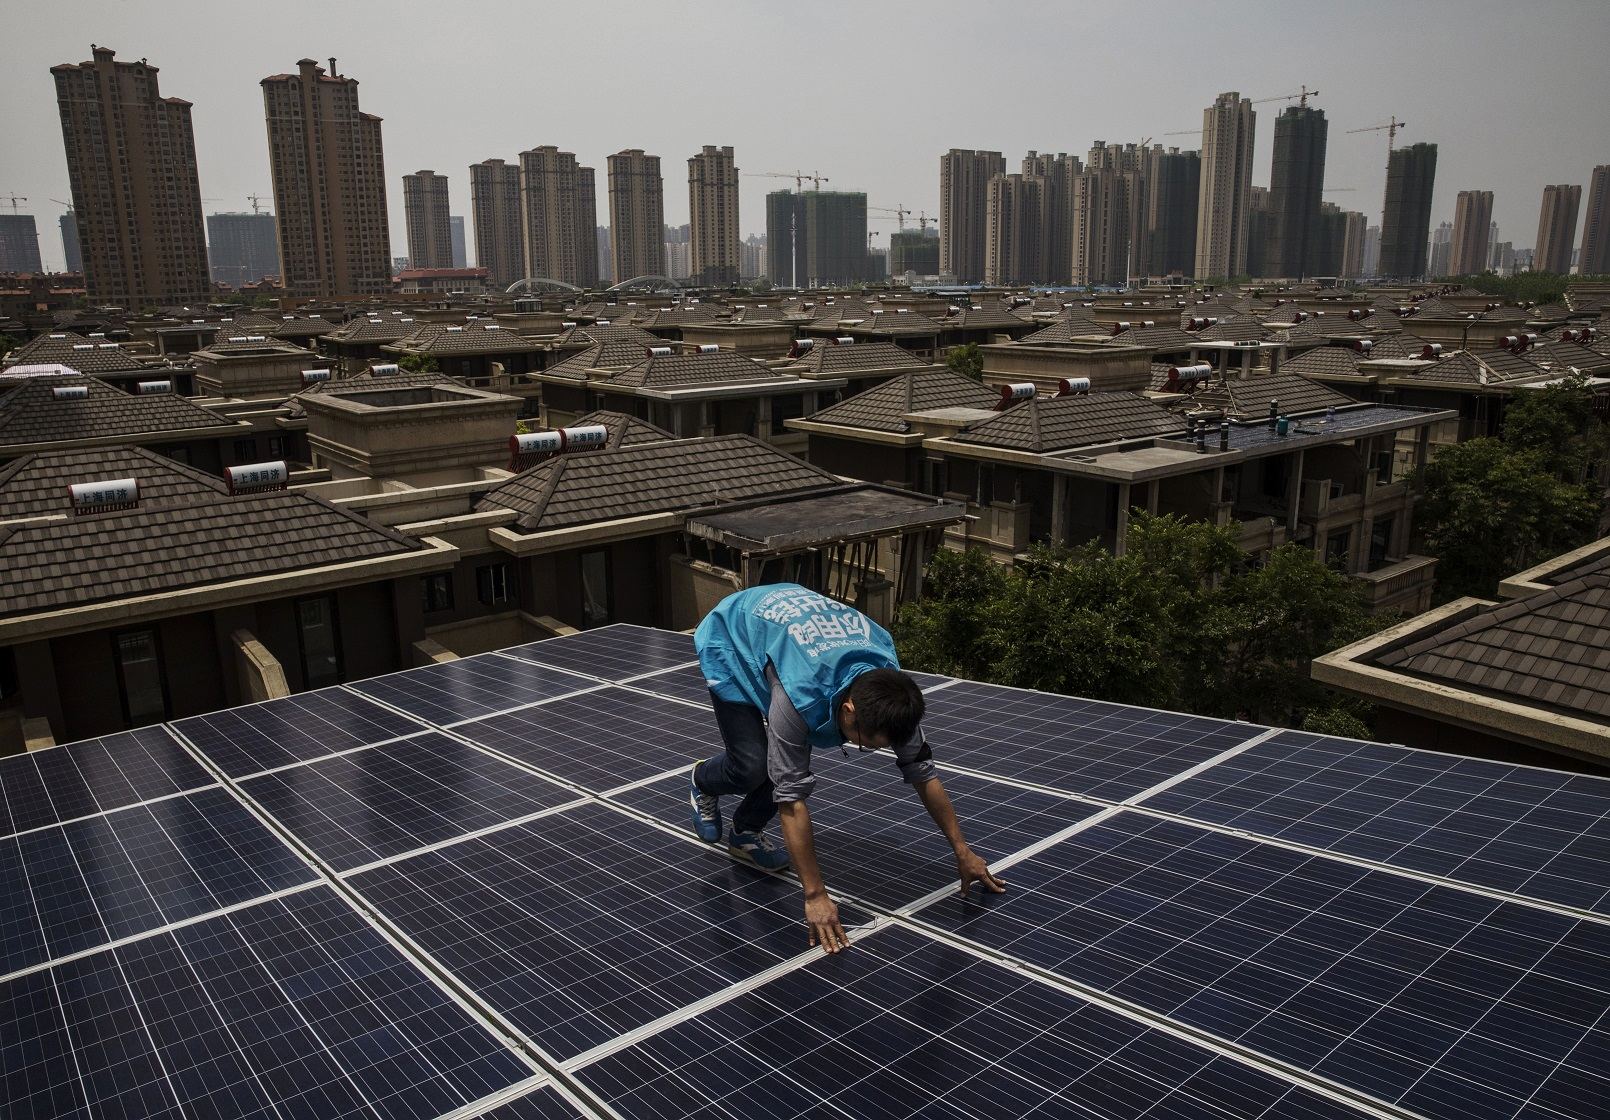 圖為2017年4月,工人在武漢市的一棟高樓上安裝光伏面板。(Photo by Kevin Frayer/Getty Images)